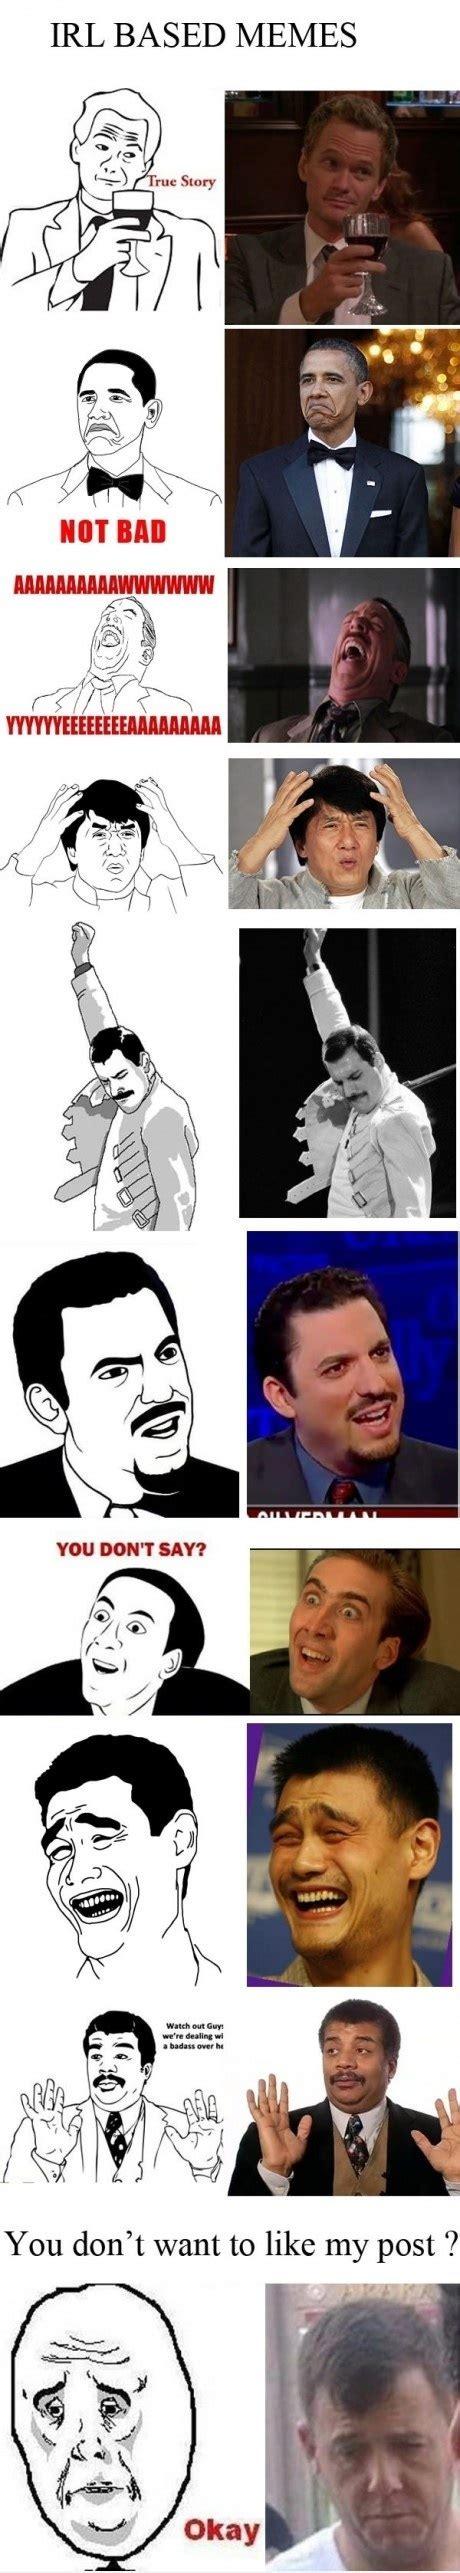 Meme Face Origins - the origin of meme face image humor satire parody mod db